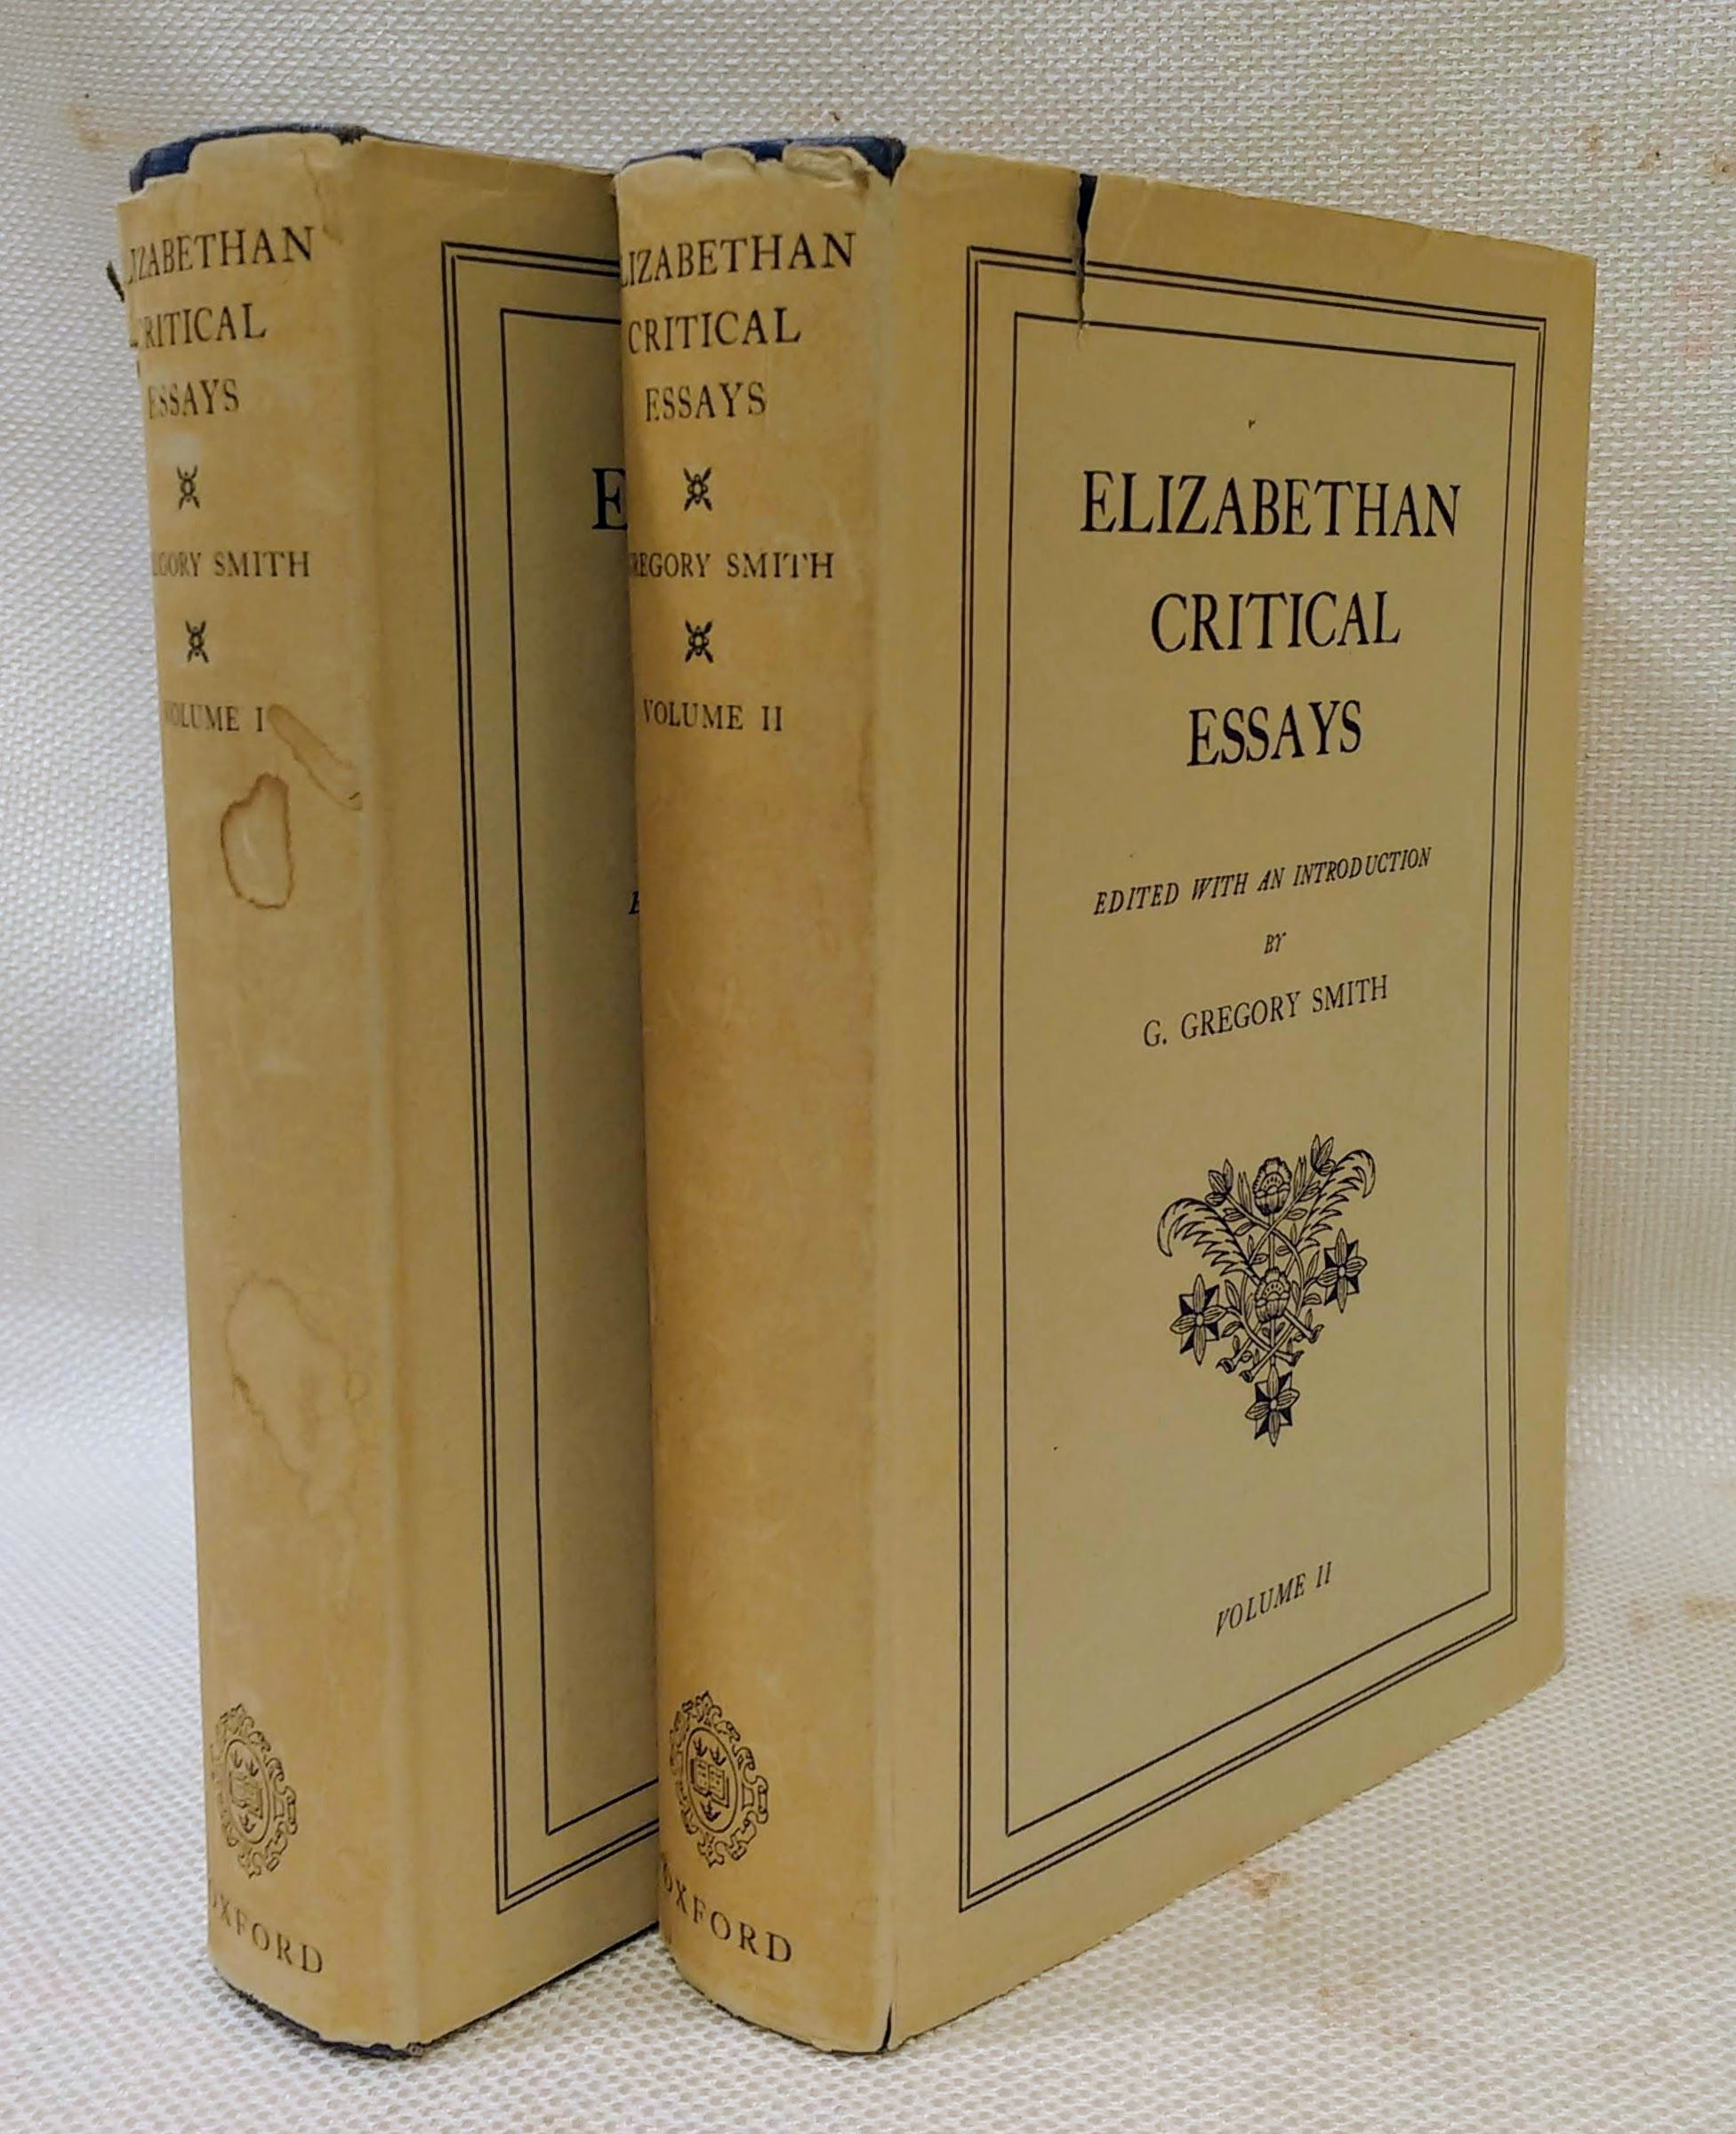 Elizabethan Critical Essays. Volumes 1 & 2, SMITH, G. GREGORY